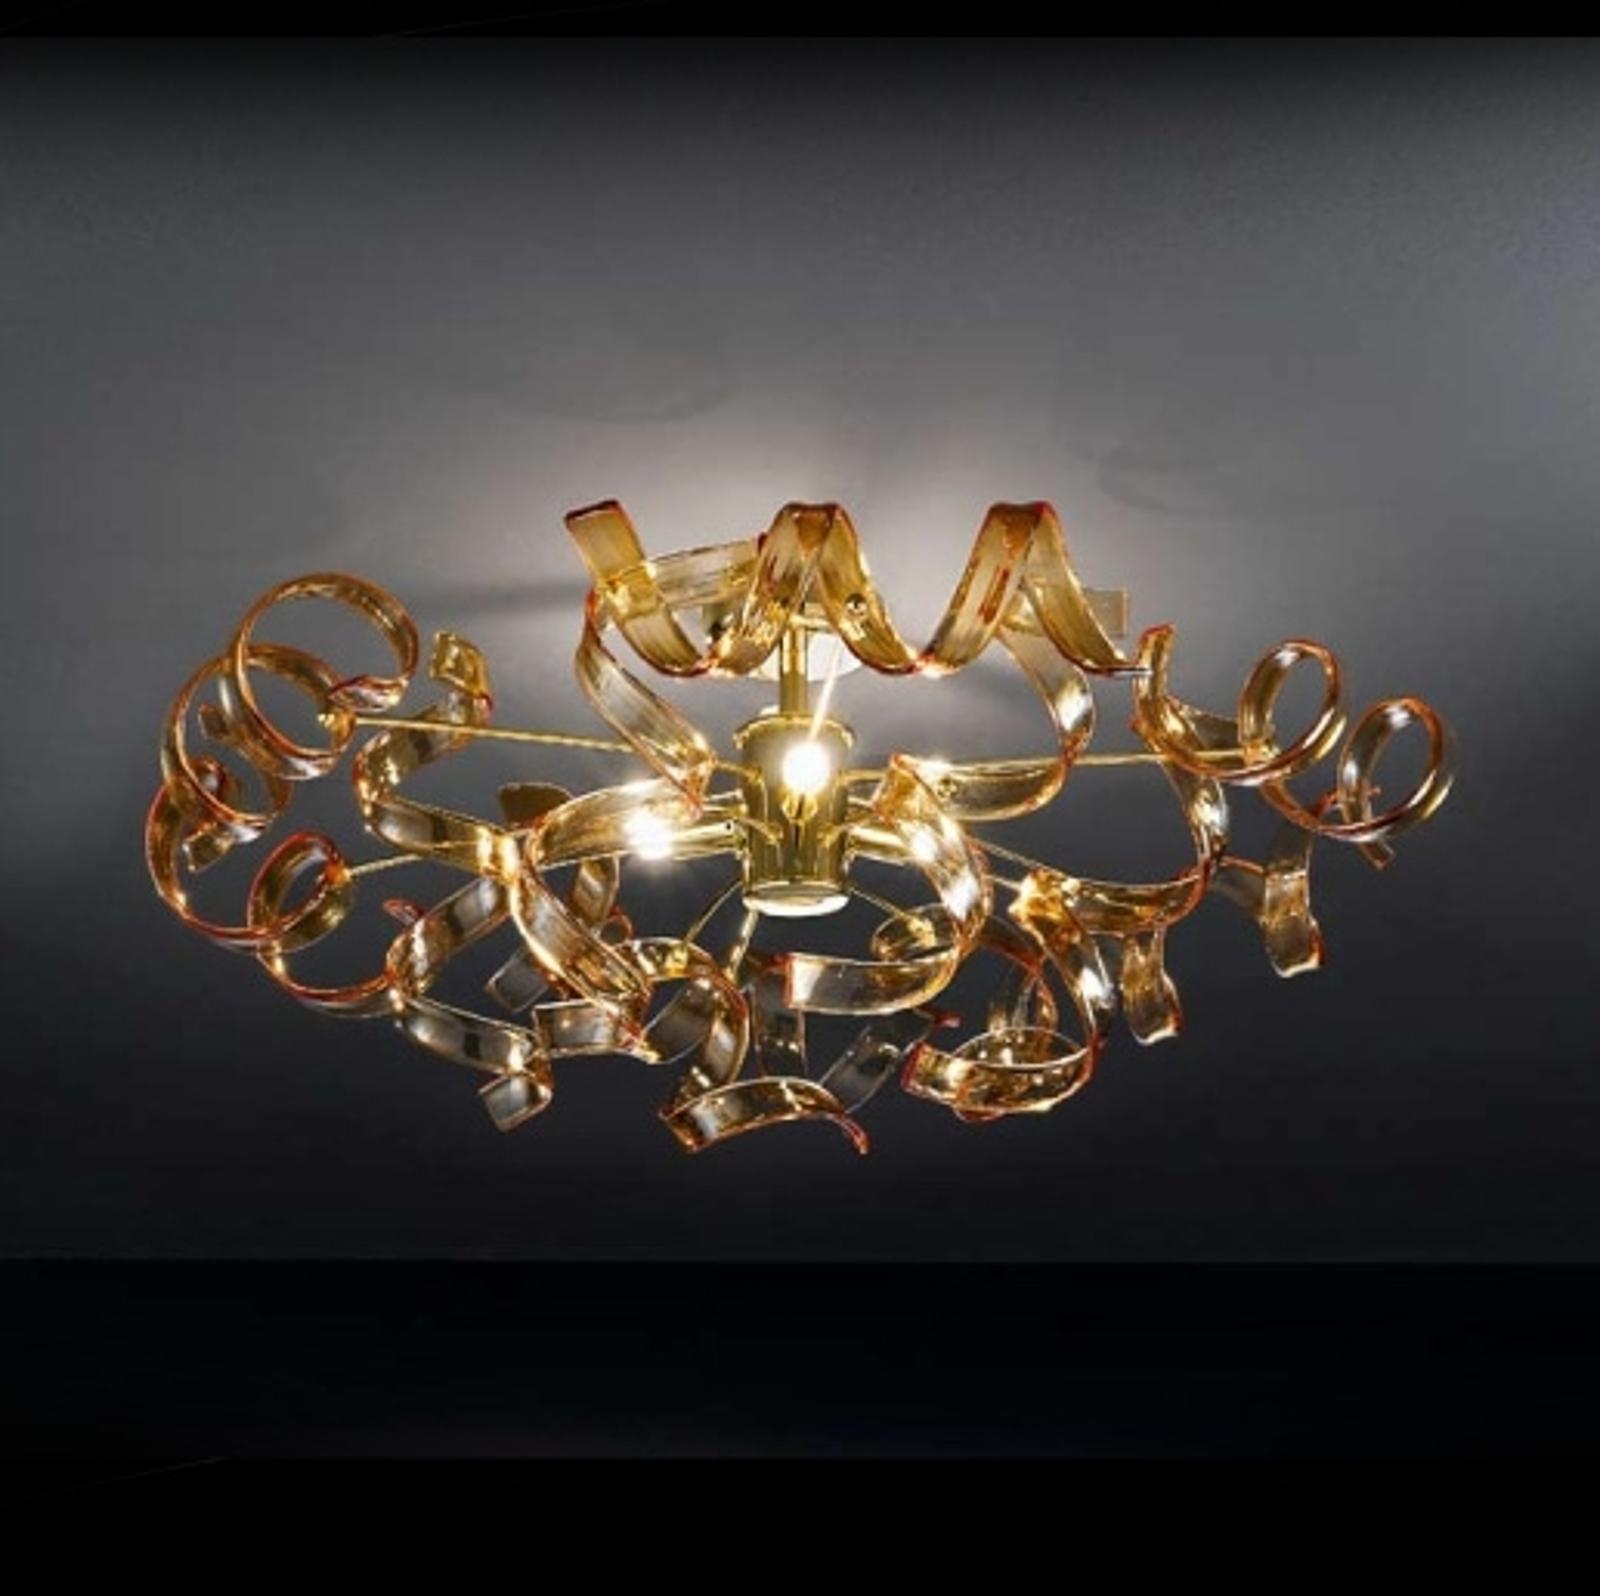 Lampa sufitowa Amber śred. 60 cm, kolor bursztynu